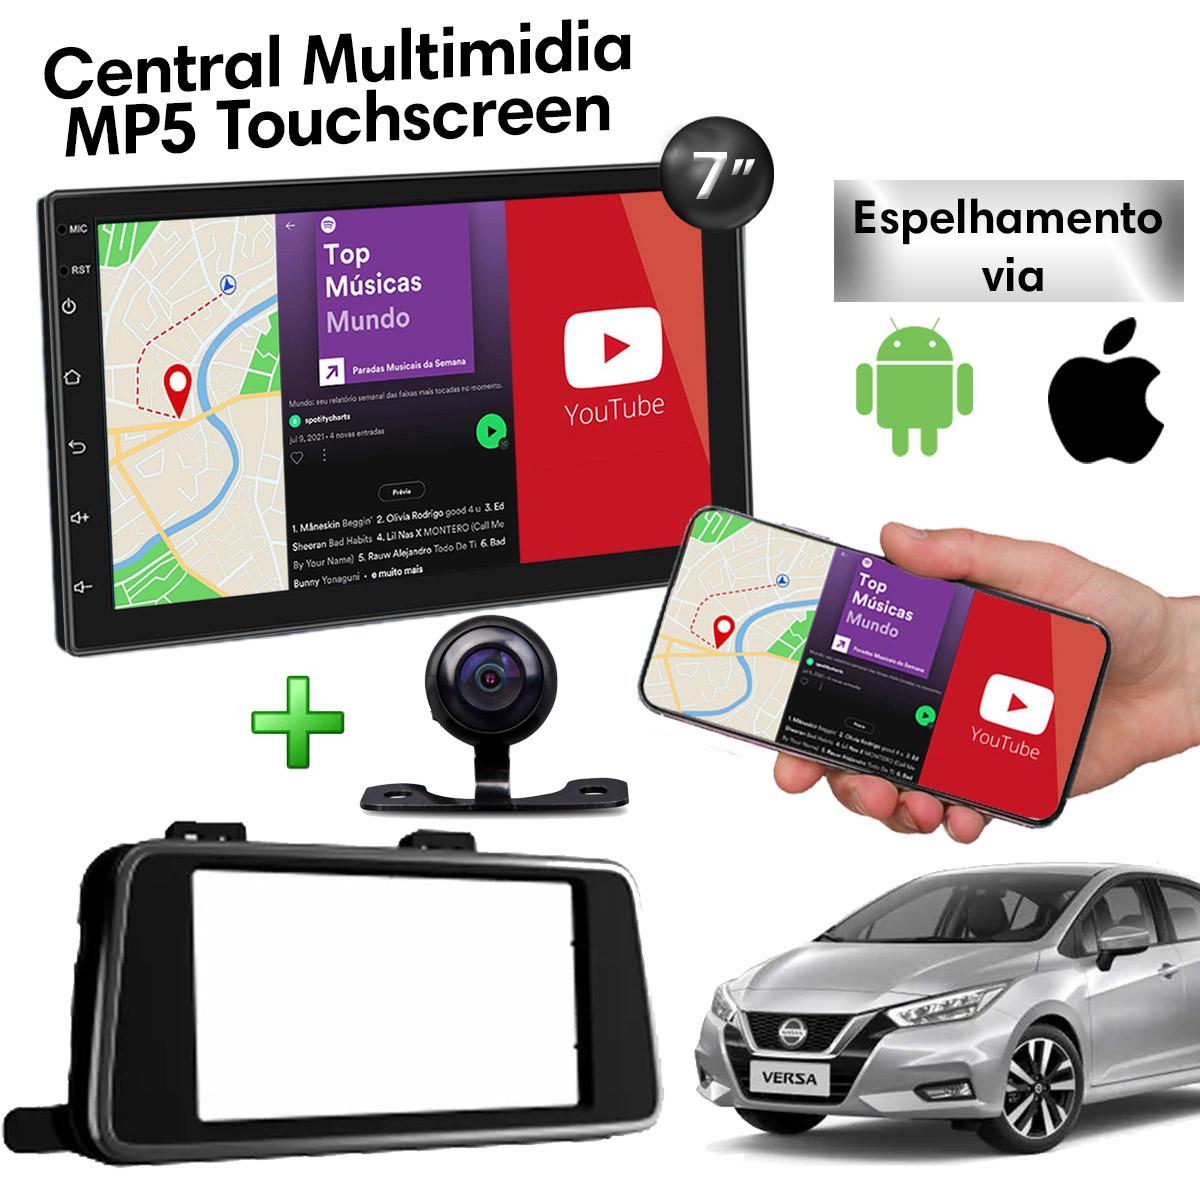 Central Multimidia com Moldura Nissan Versa Mp5 Bluetooth Usb Touchscreen 7 Polegadas 2 Din Black Piano 2021 Poliparts